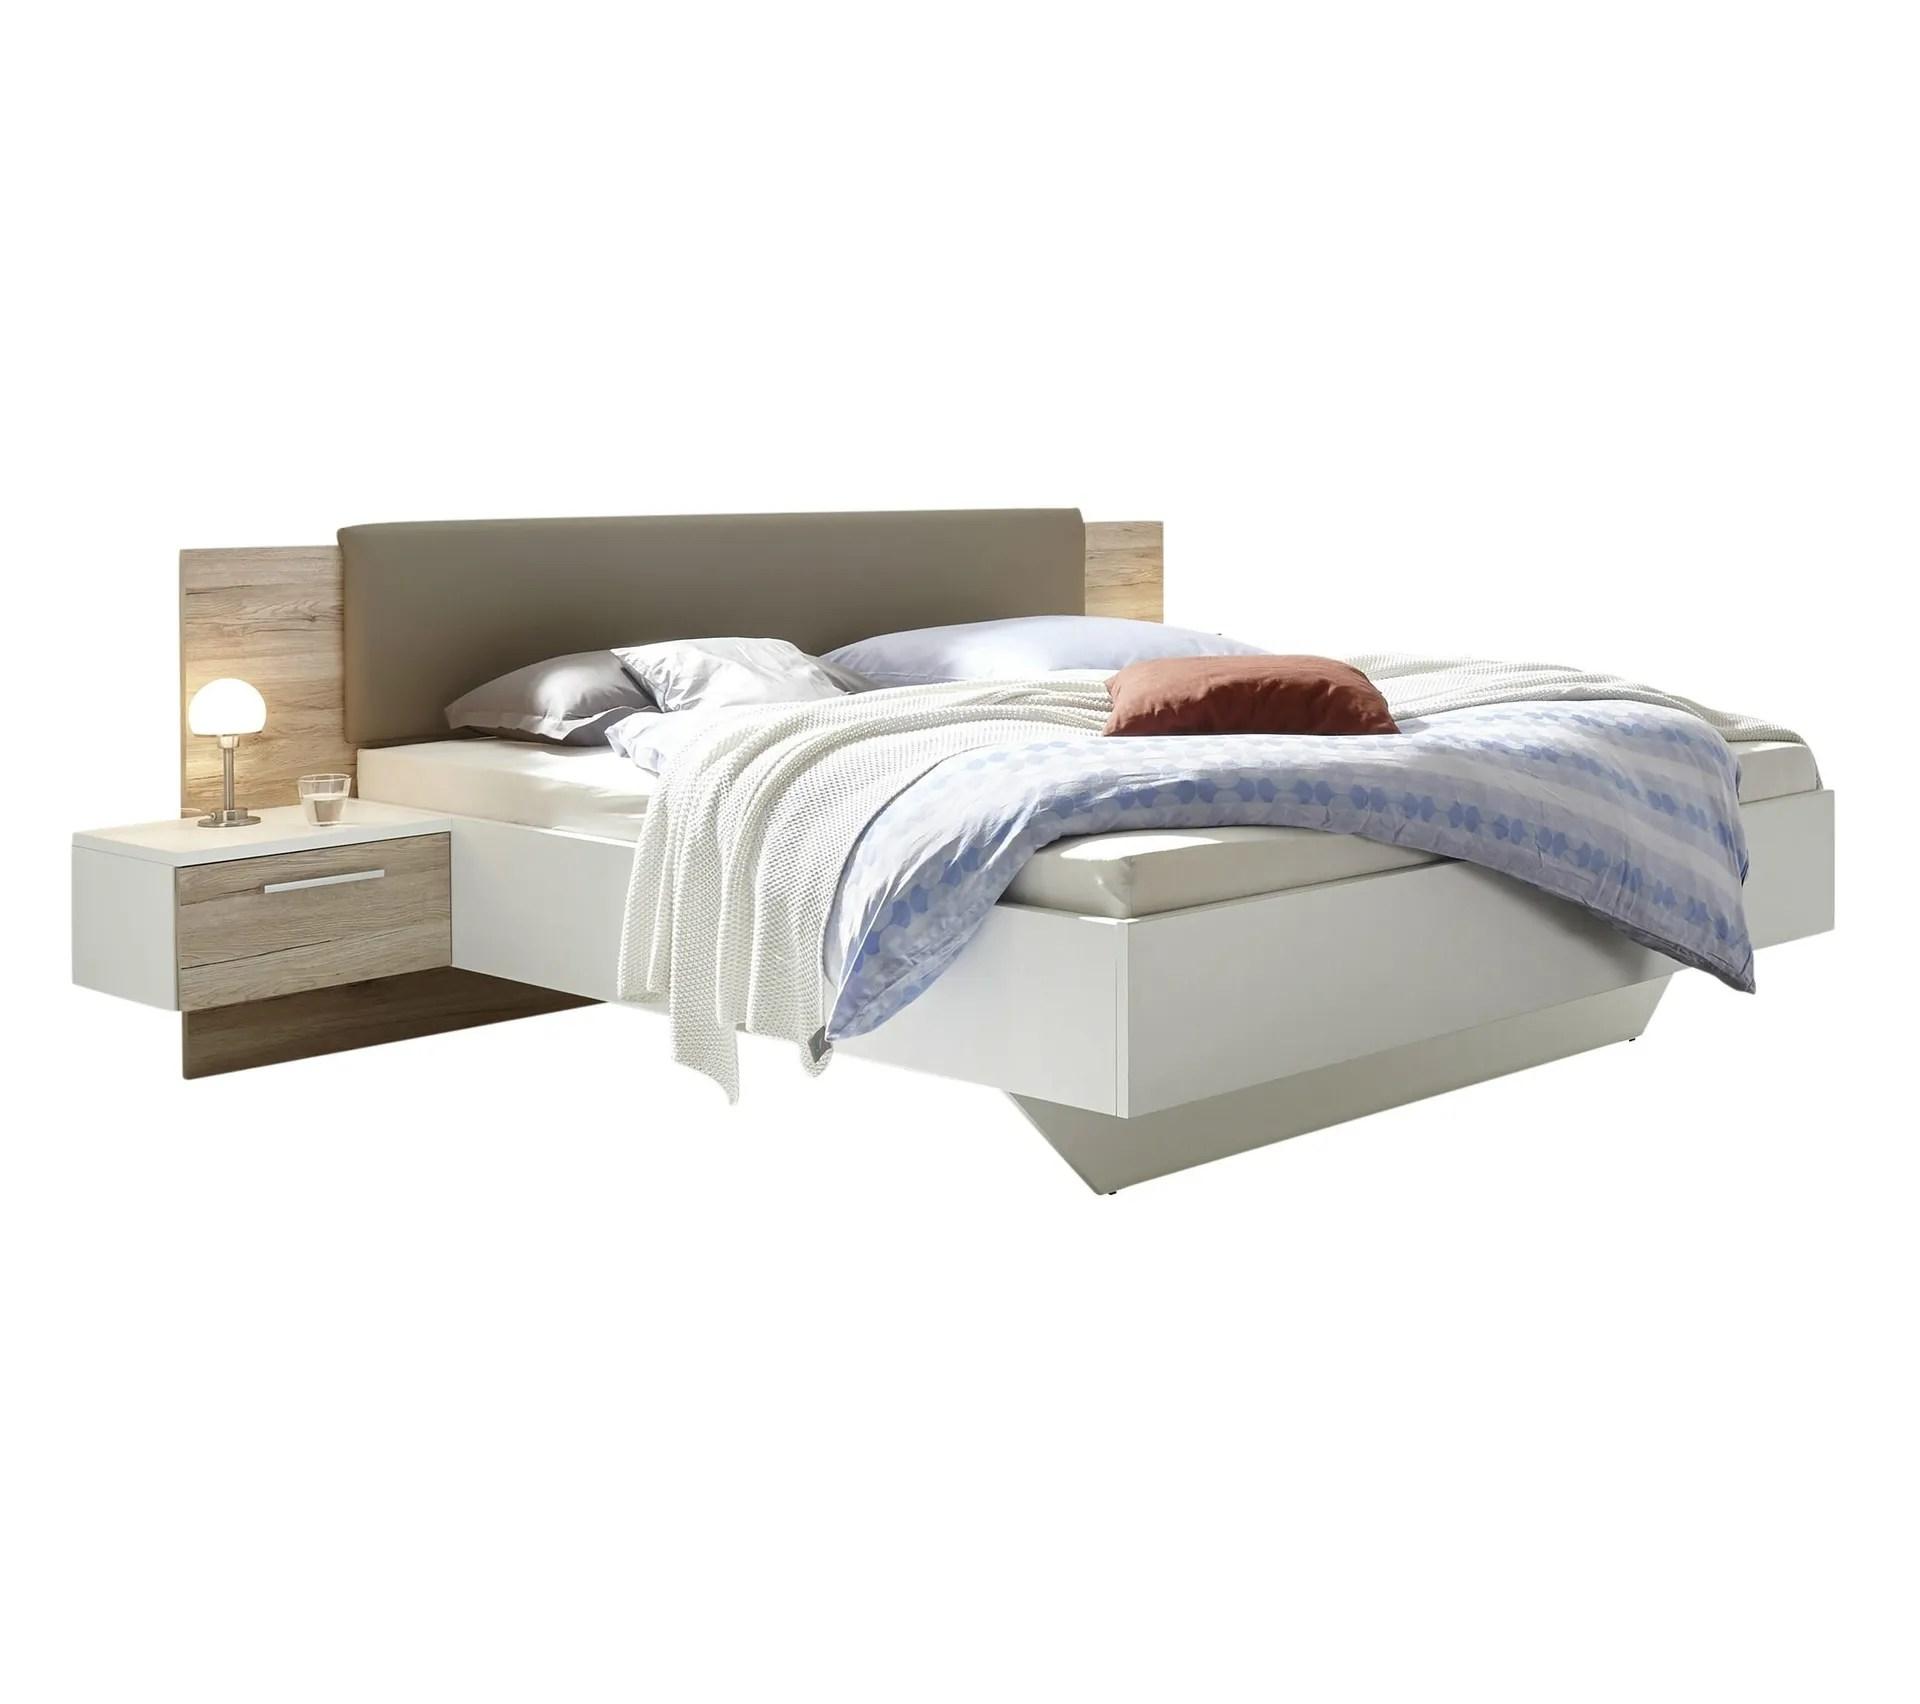 lit 160x200 cm avec chevets suspendus gravita imitation chene et blanc